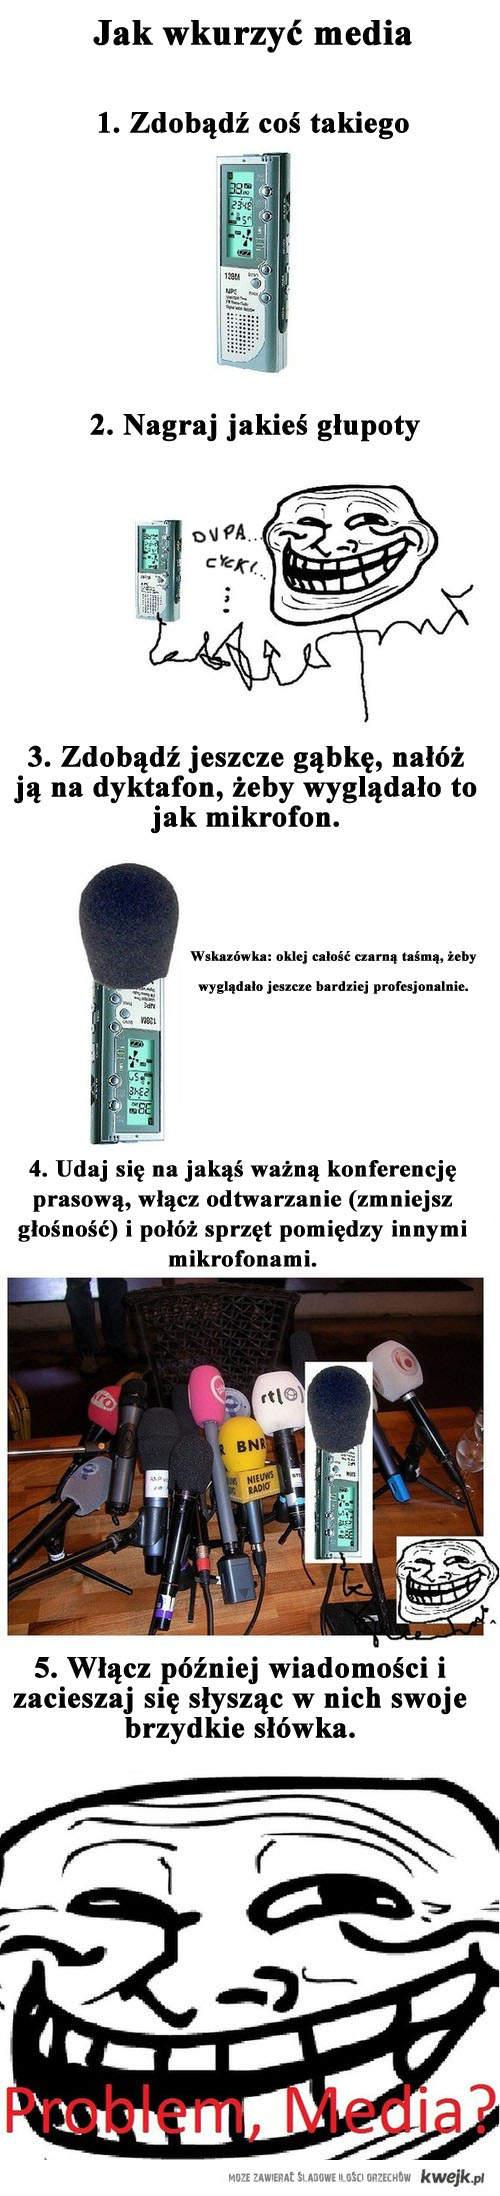 problem media? ;>